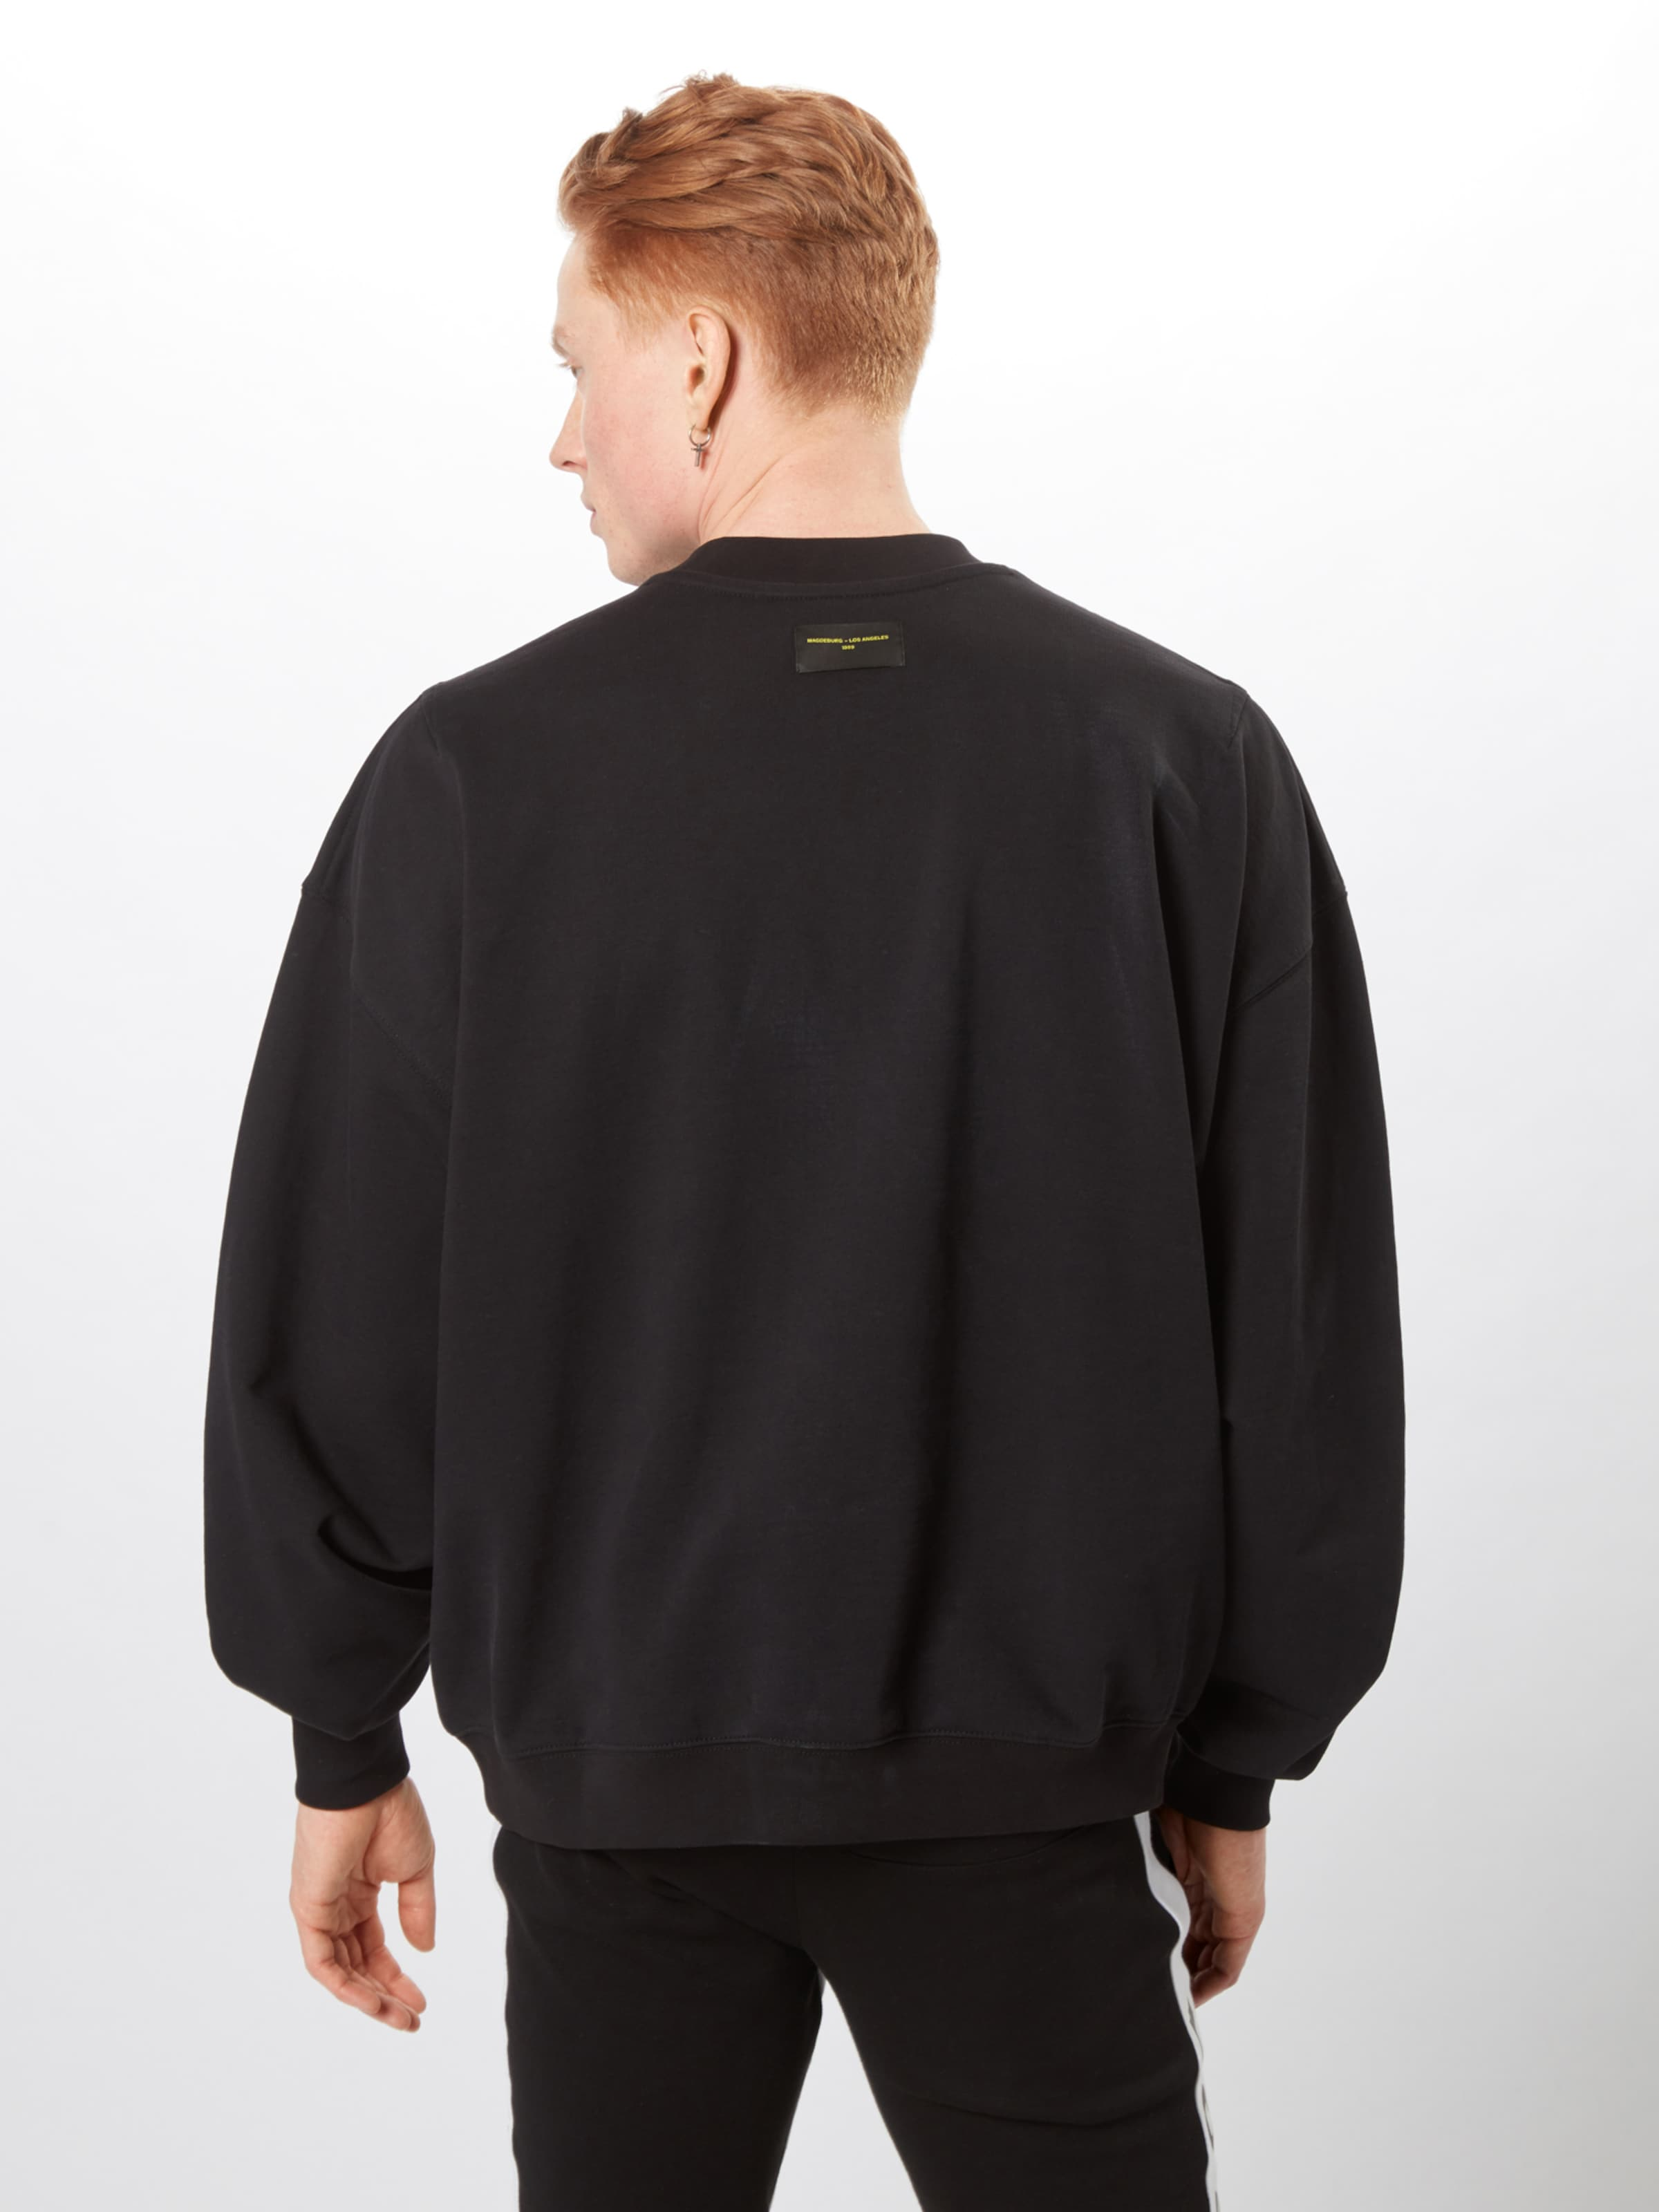 Sweat 'mdla JauneNoir En shirt MagdeburgLos Angeles Logo' WoxdBerC